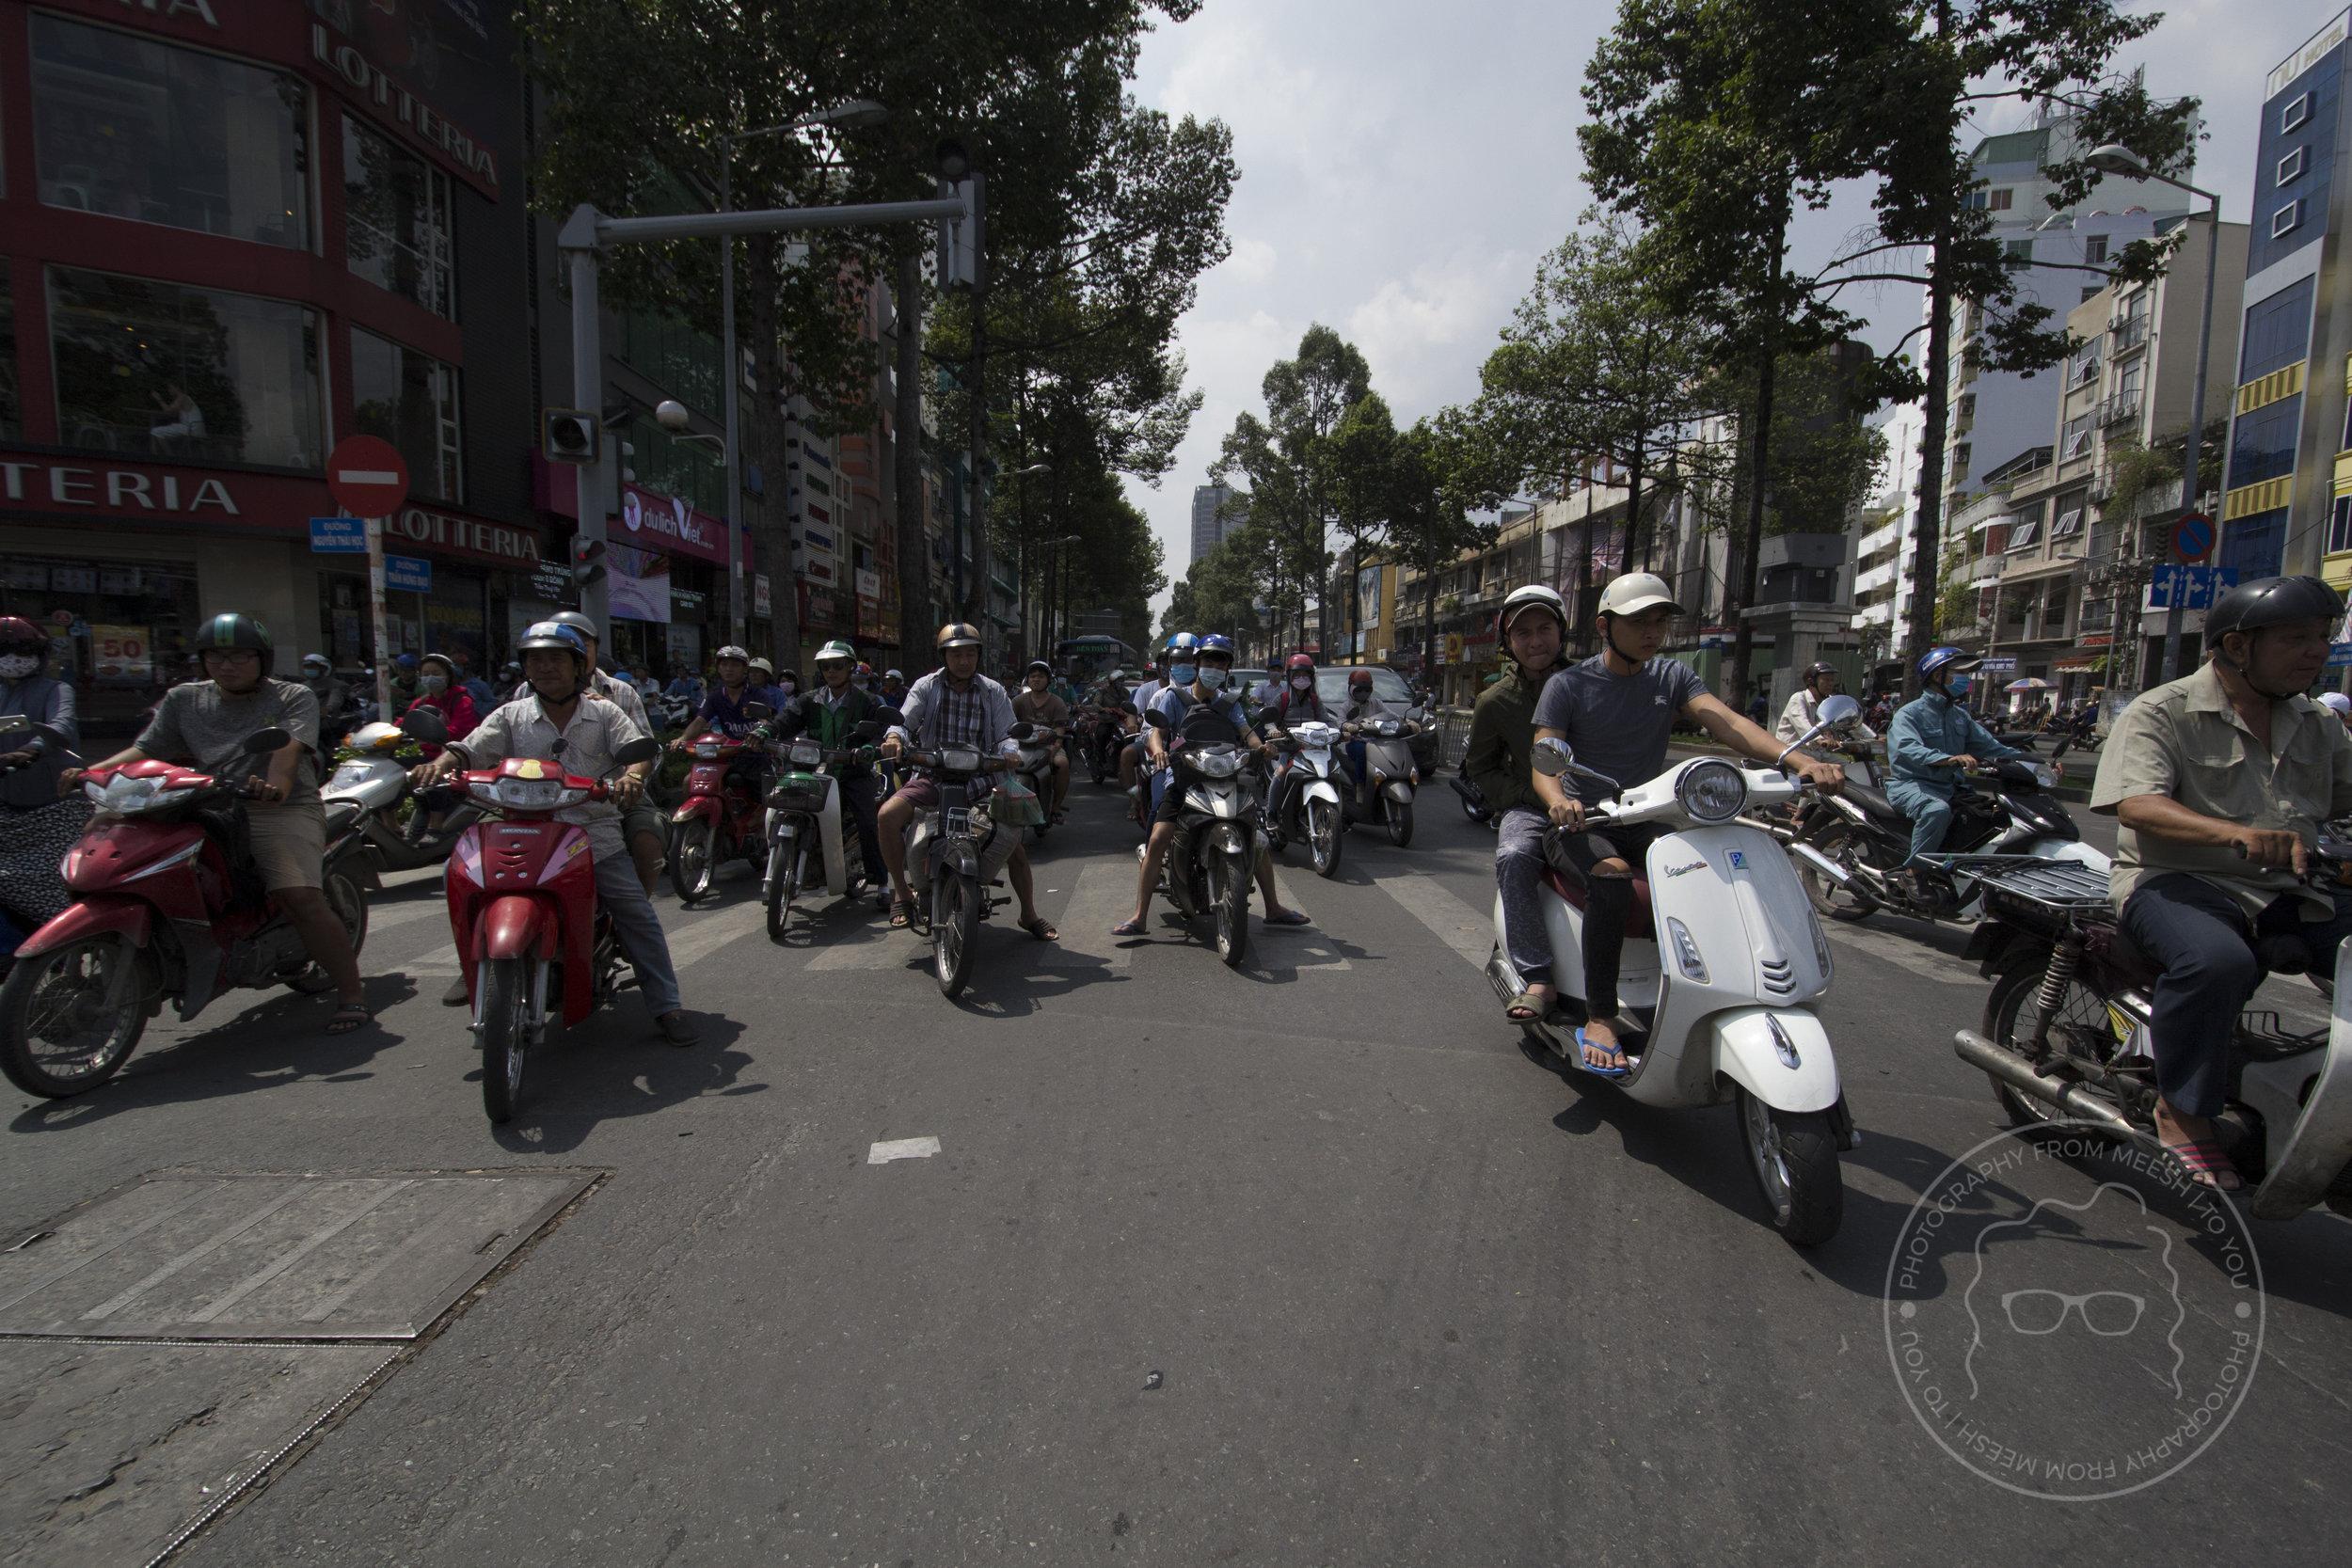 Motorbikes | Ho Chi Min City, Vietnam | 2017